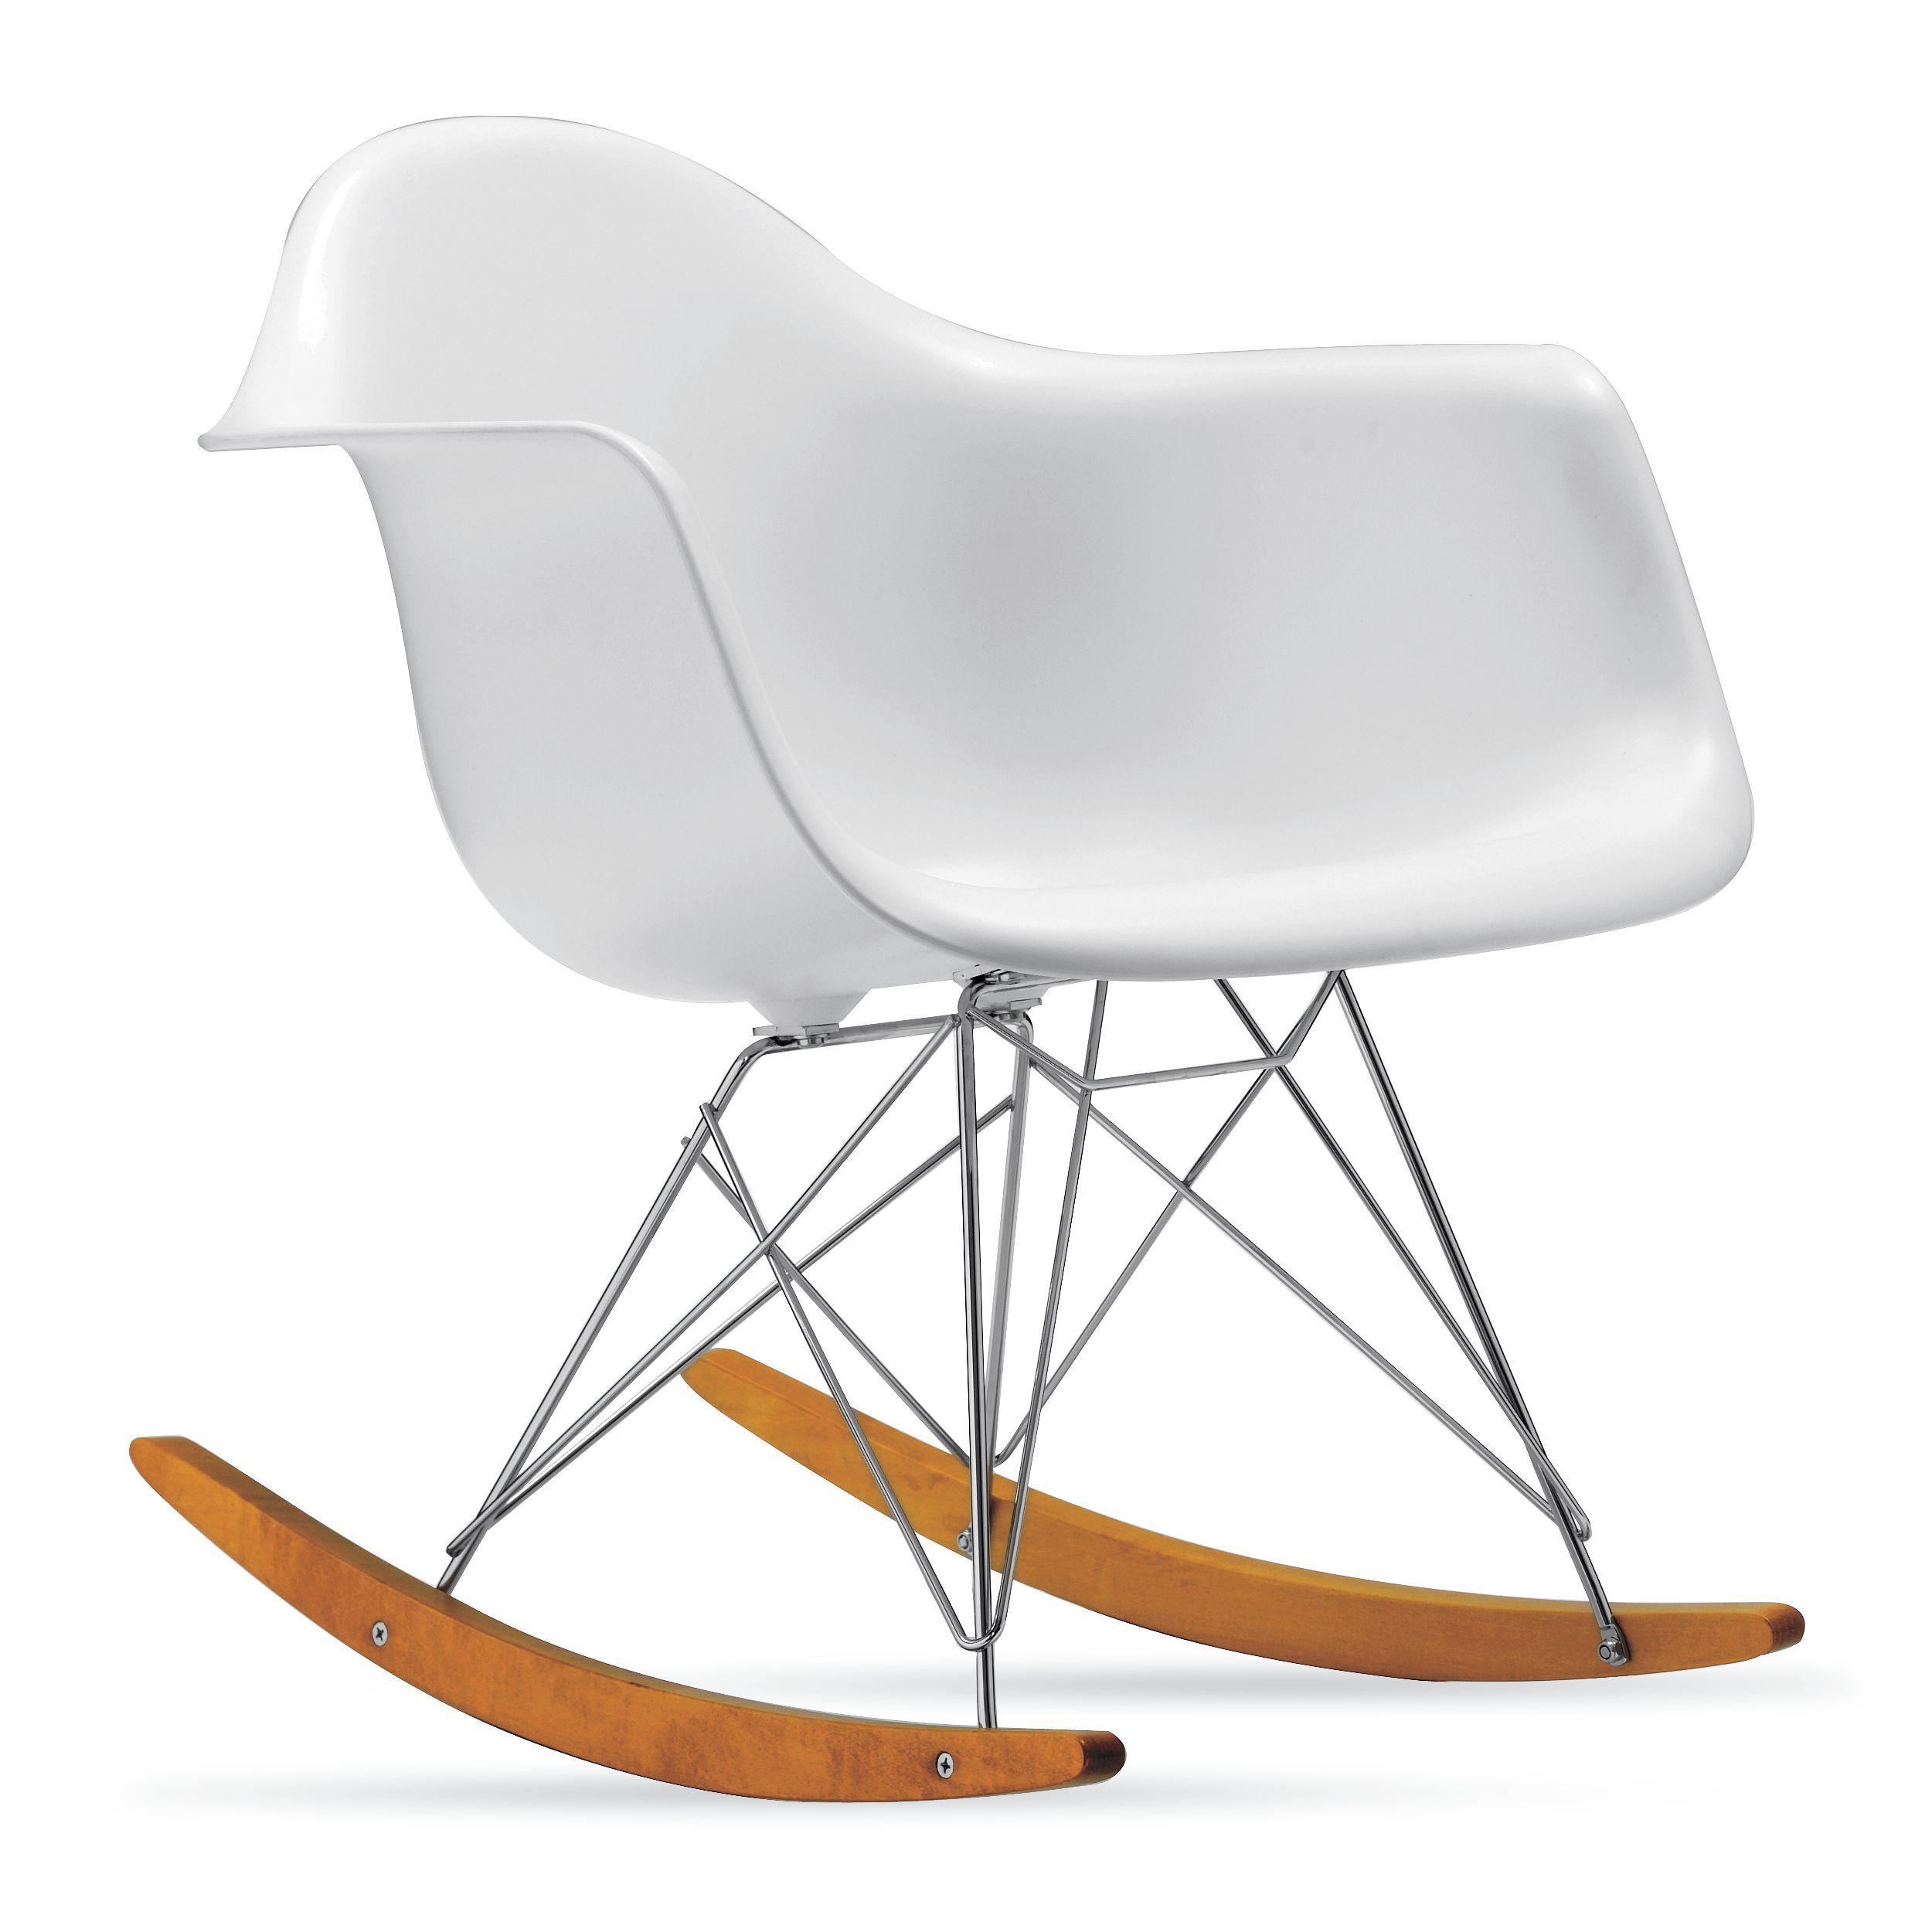 Eames Molded Plastic Rocker Rar Chaise A Bascule Eames Chaise A Bascule Chaise Design